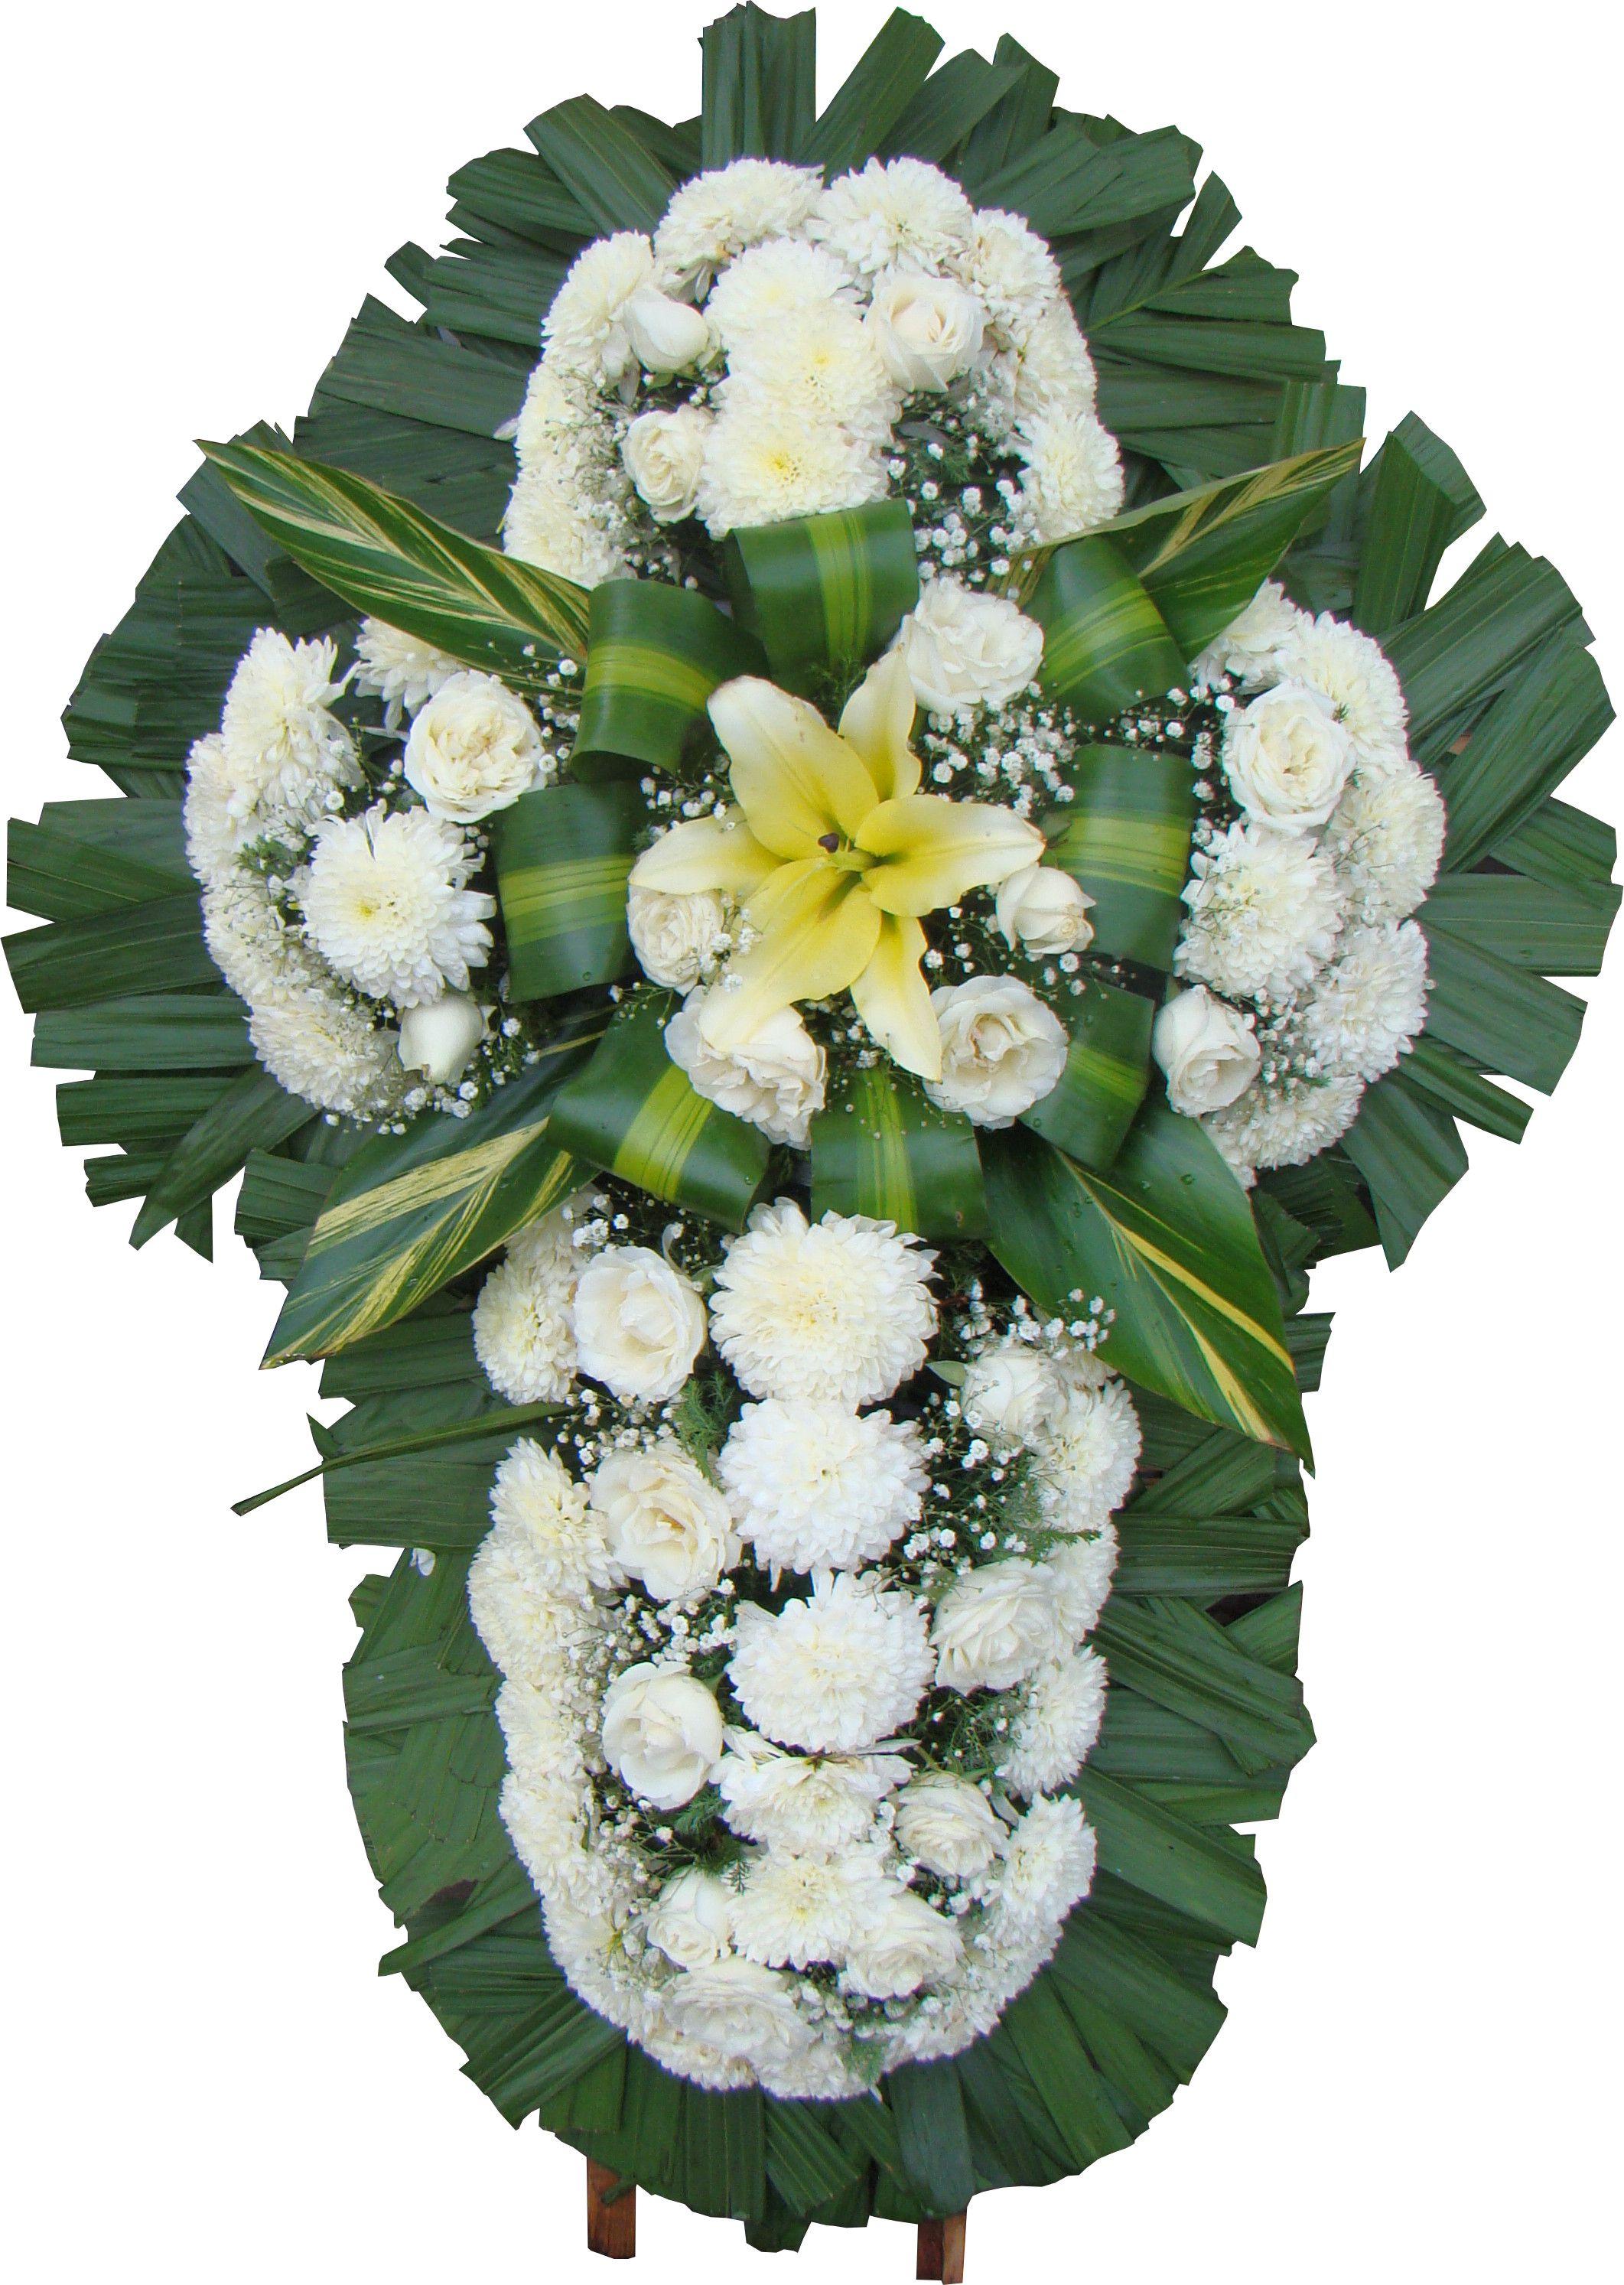 Corona de flores para funeral en forma de cruz de flores